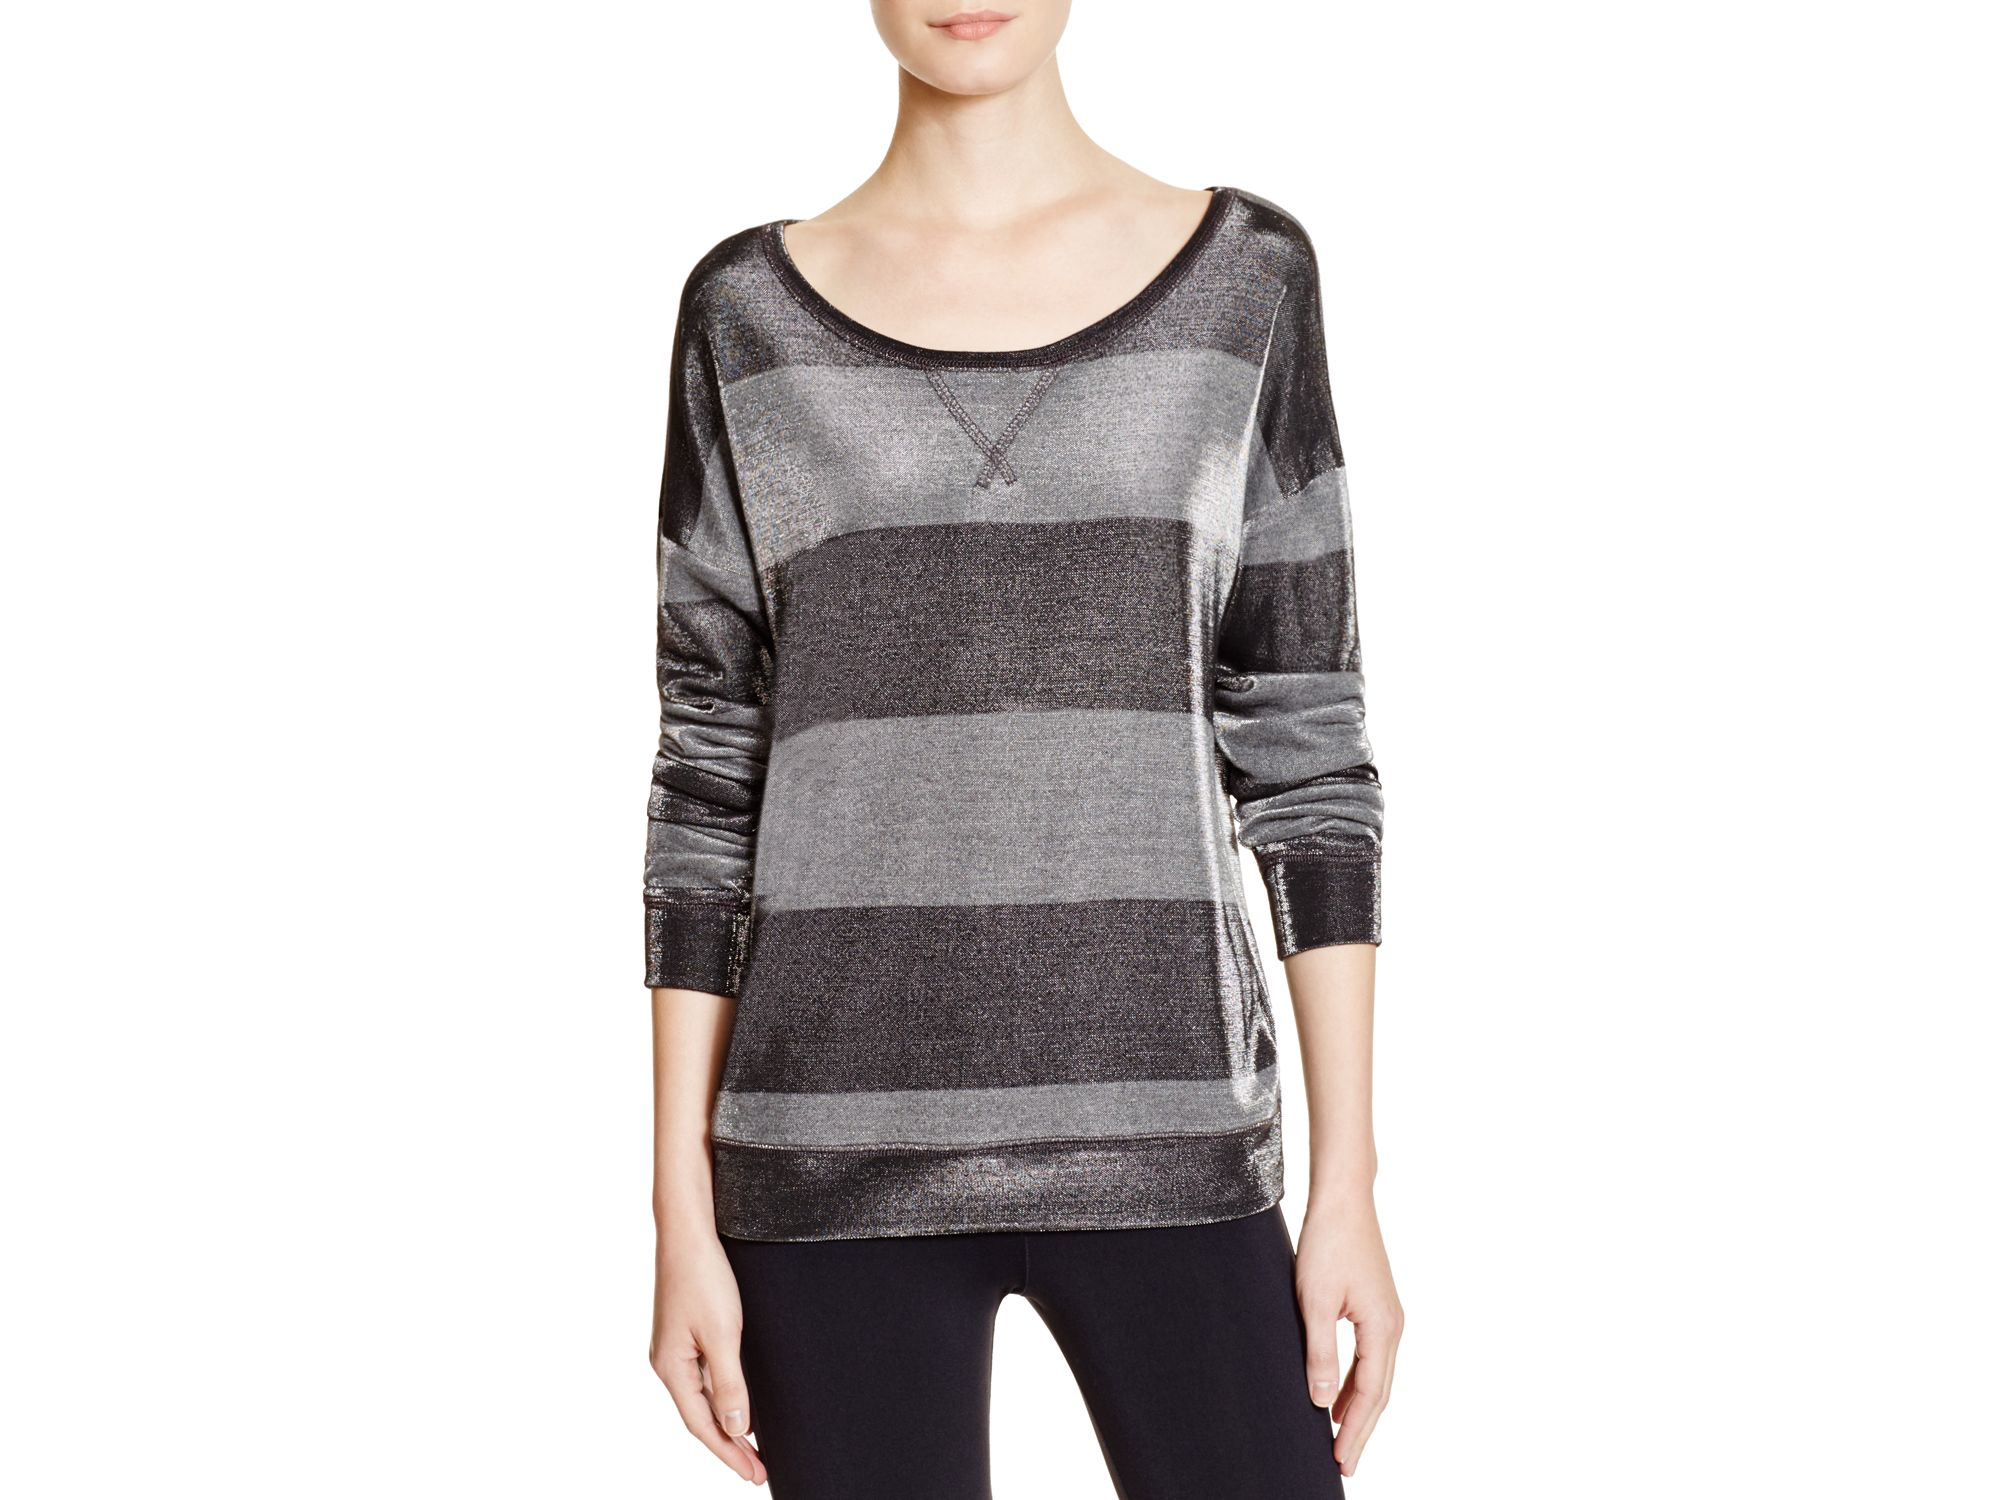 b73a06ca58 Lyst - David Lerner Striped Pullover Sweater in Black